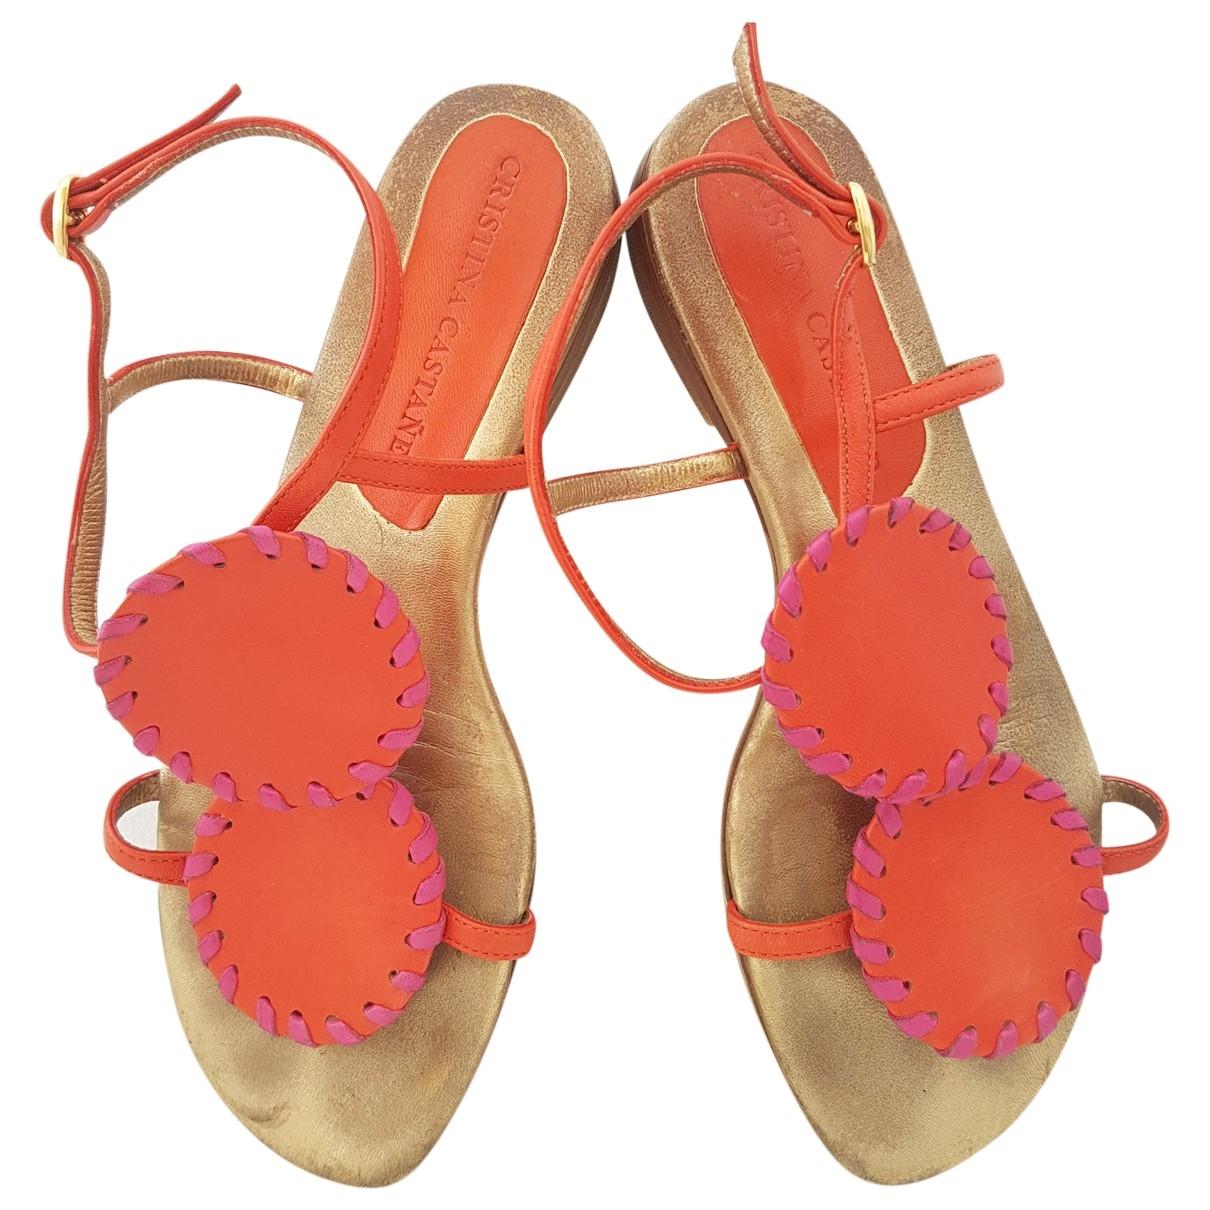 Sandalias de Cuero Non Signe / Unsigned